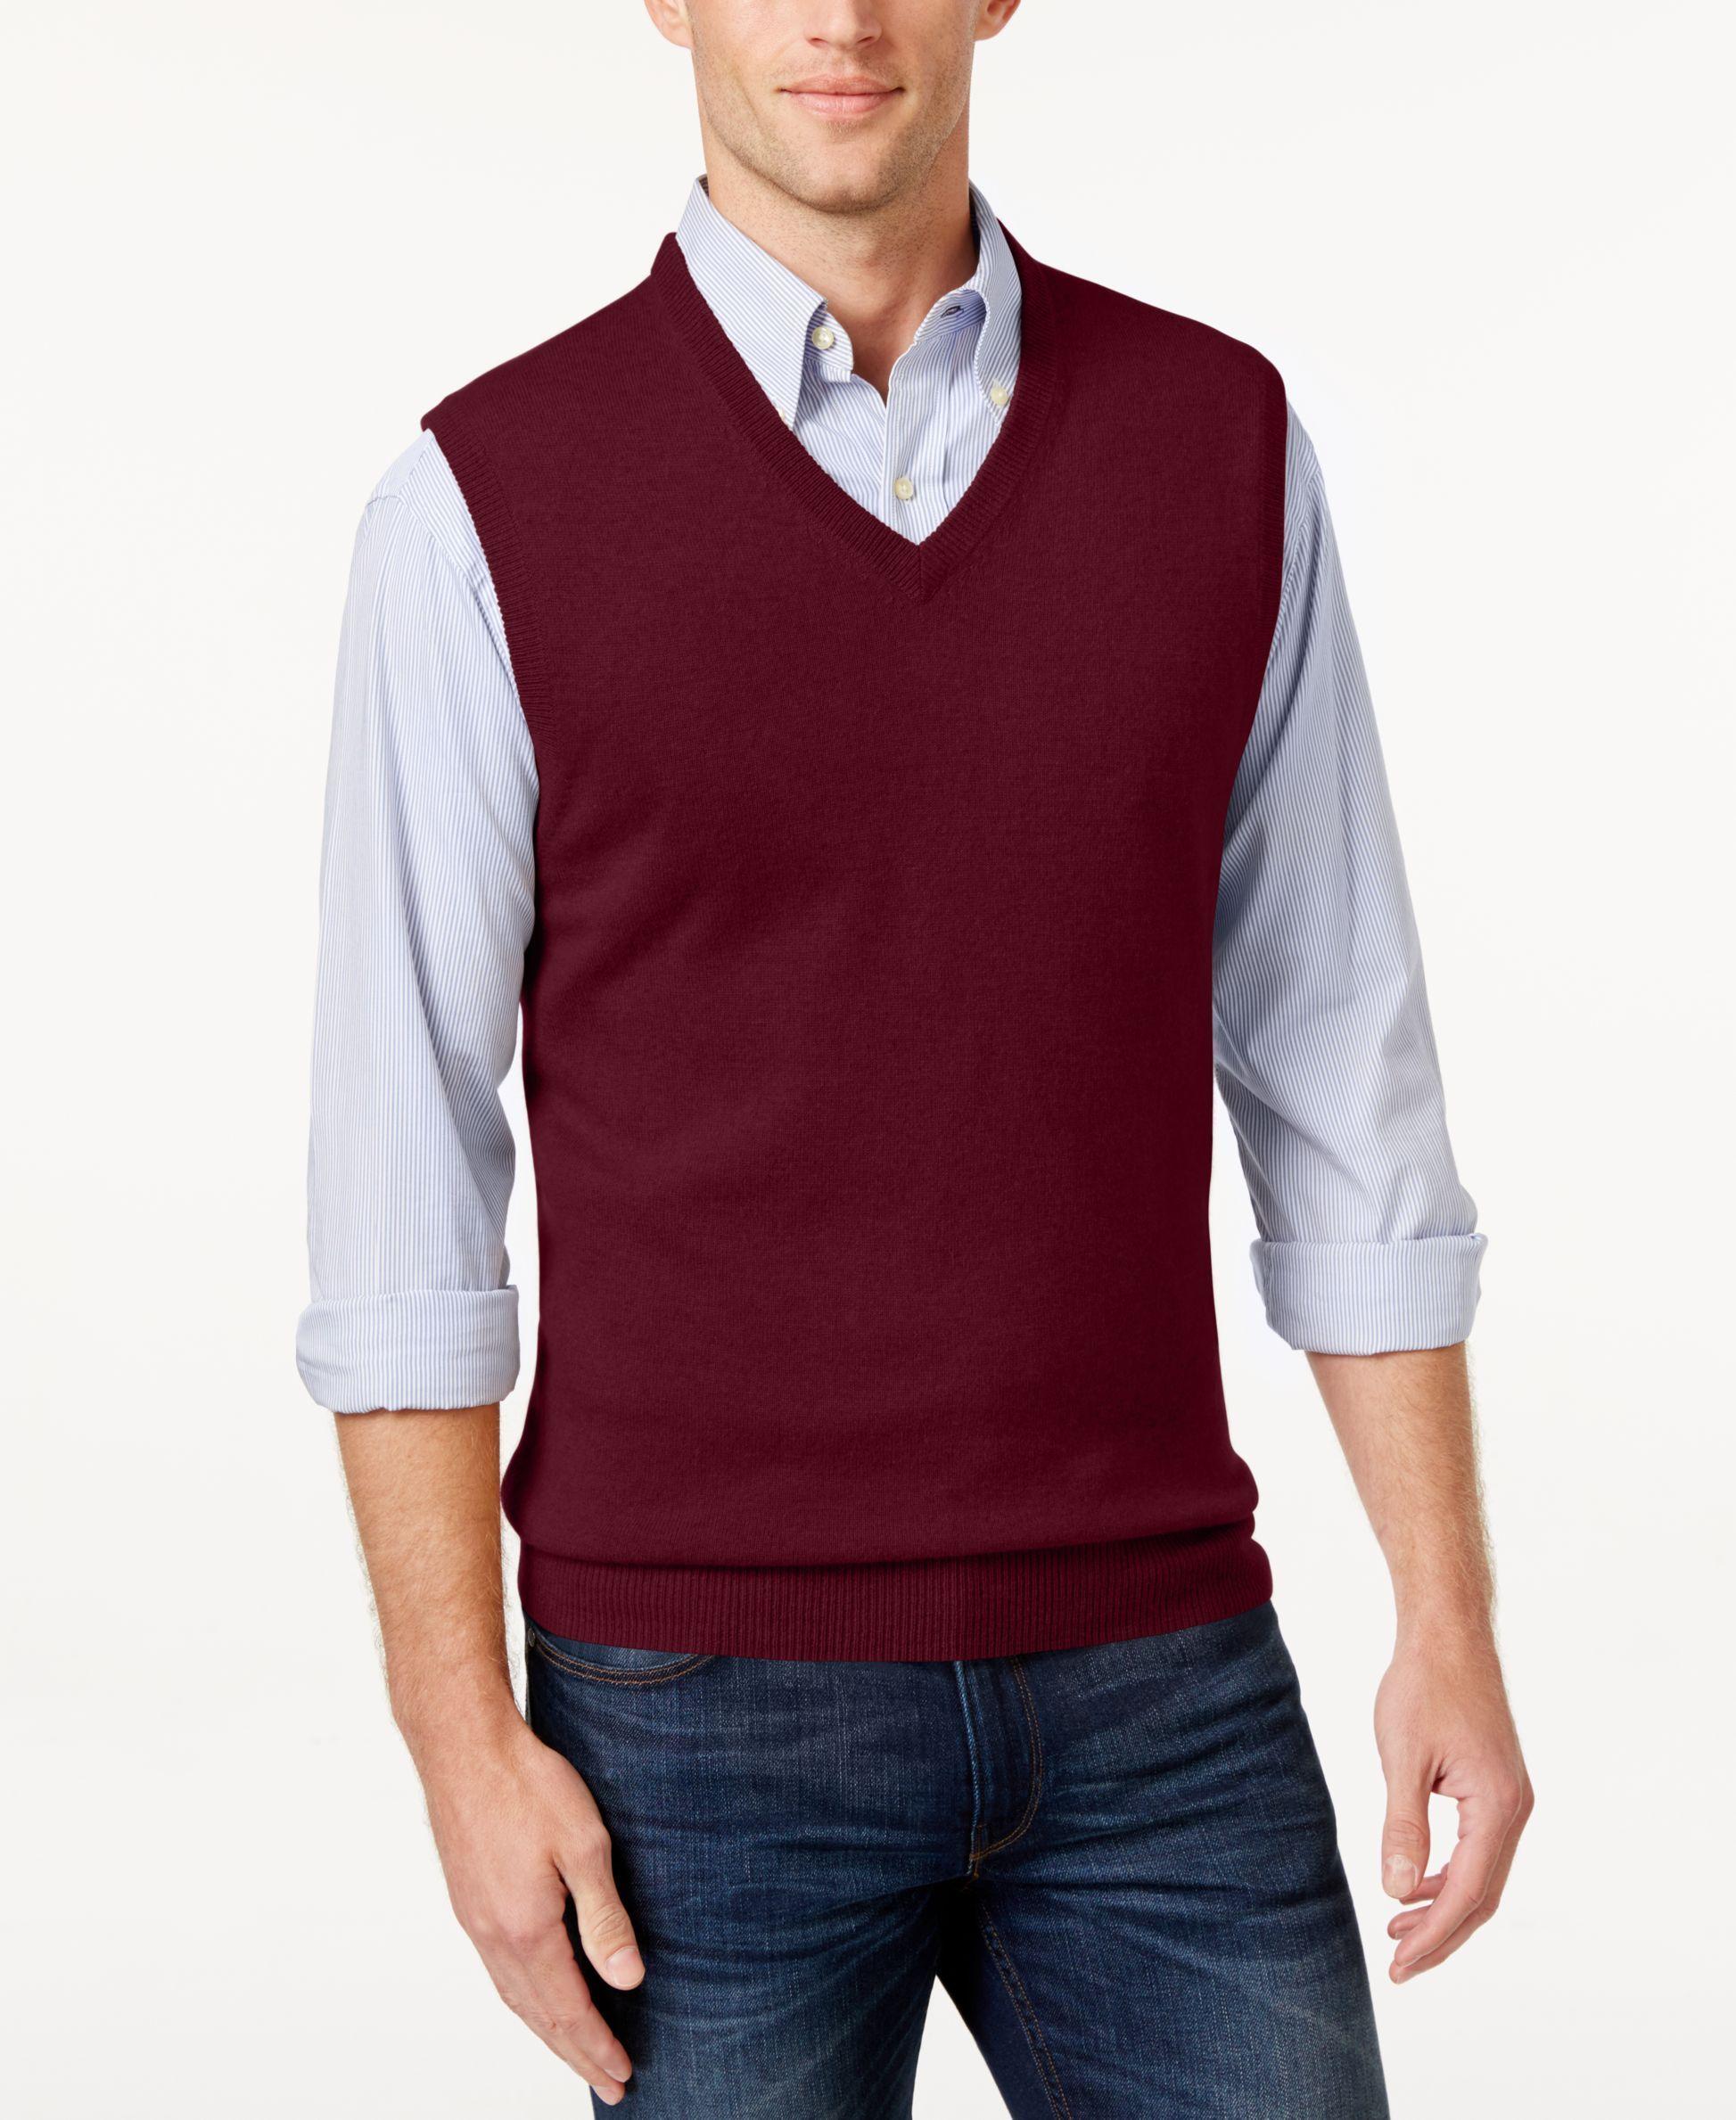 Club Room Cashmere Solid Sweater Vest | Cardigans For Men | Pinterest